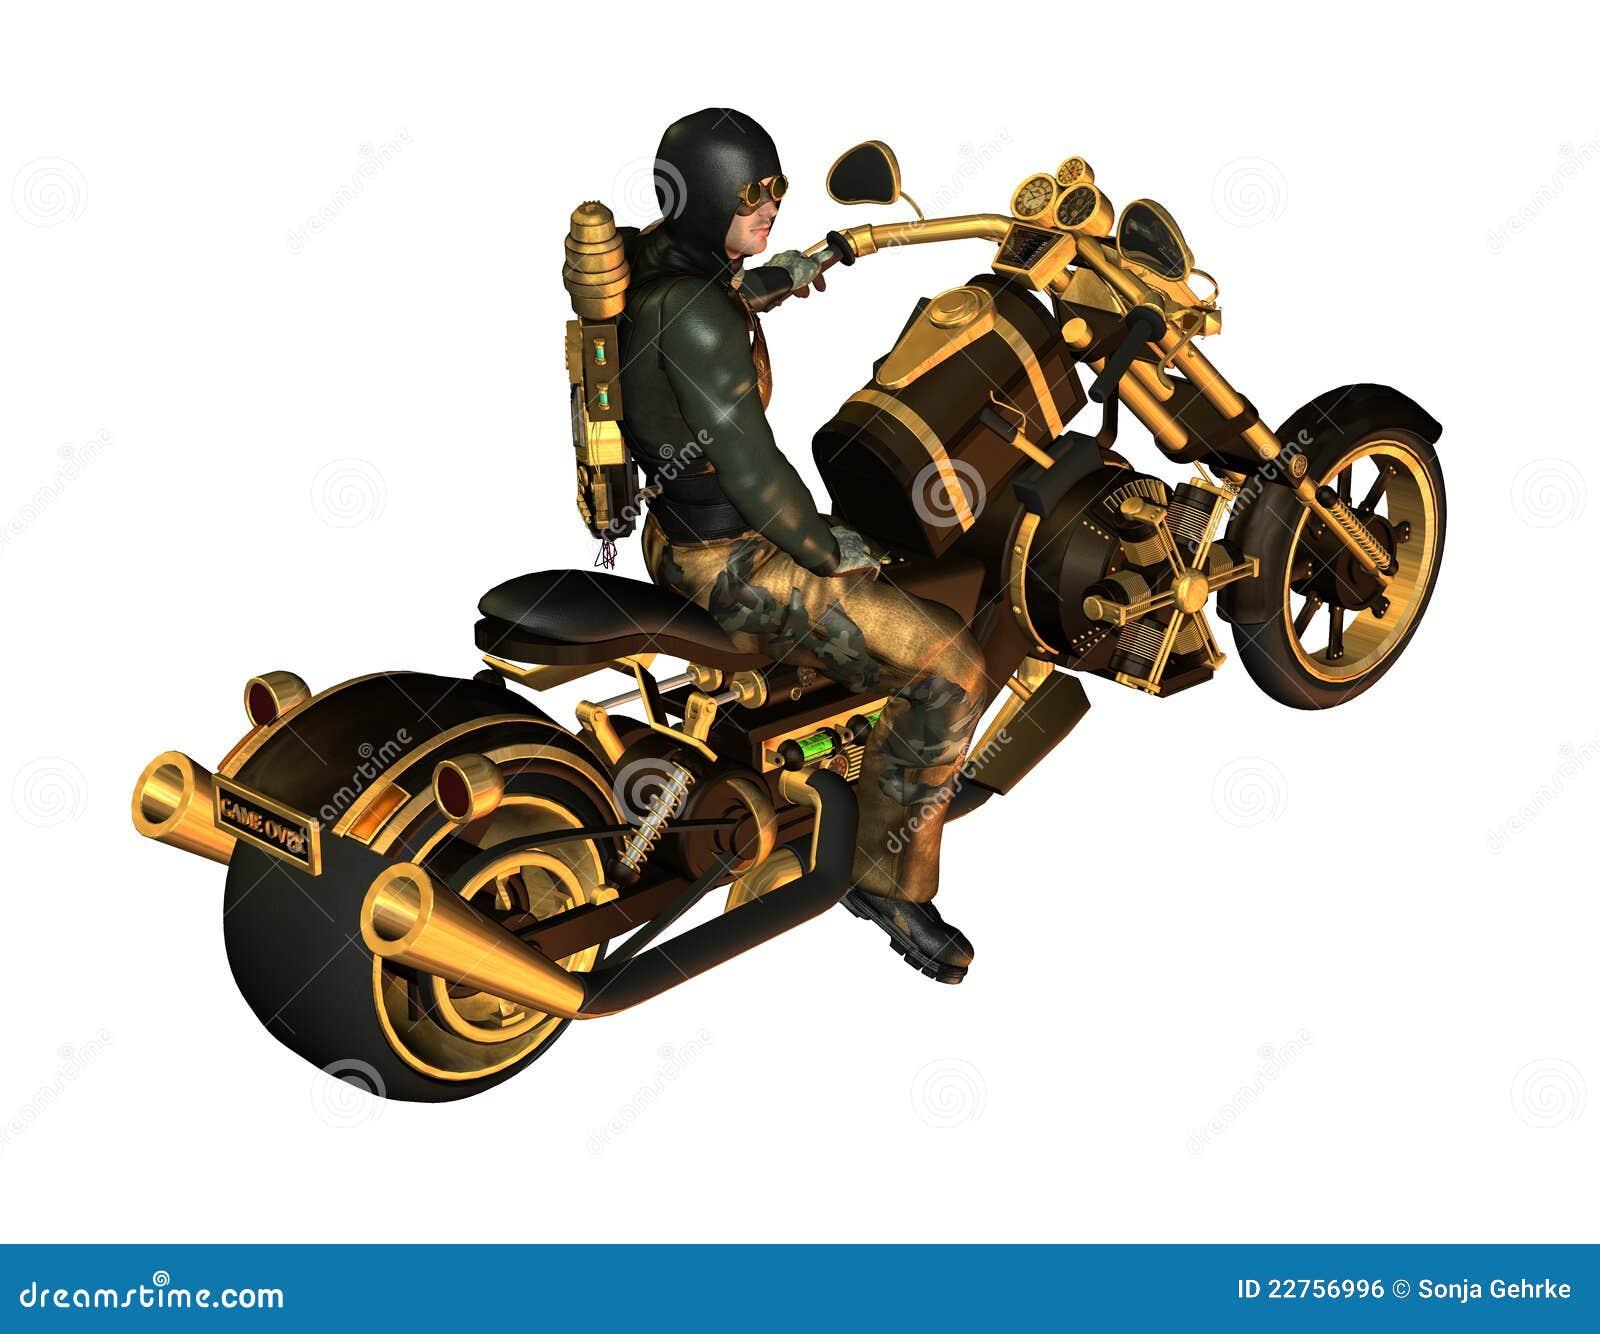 Fietser op een motorfiets Steampunk